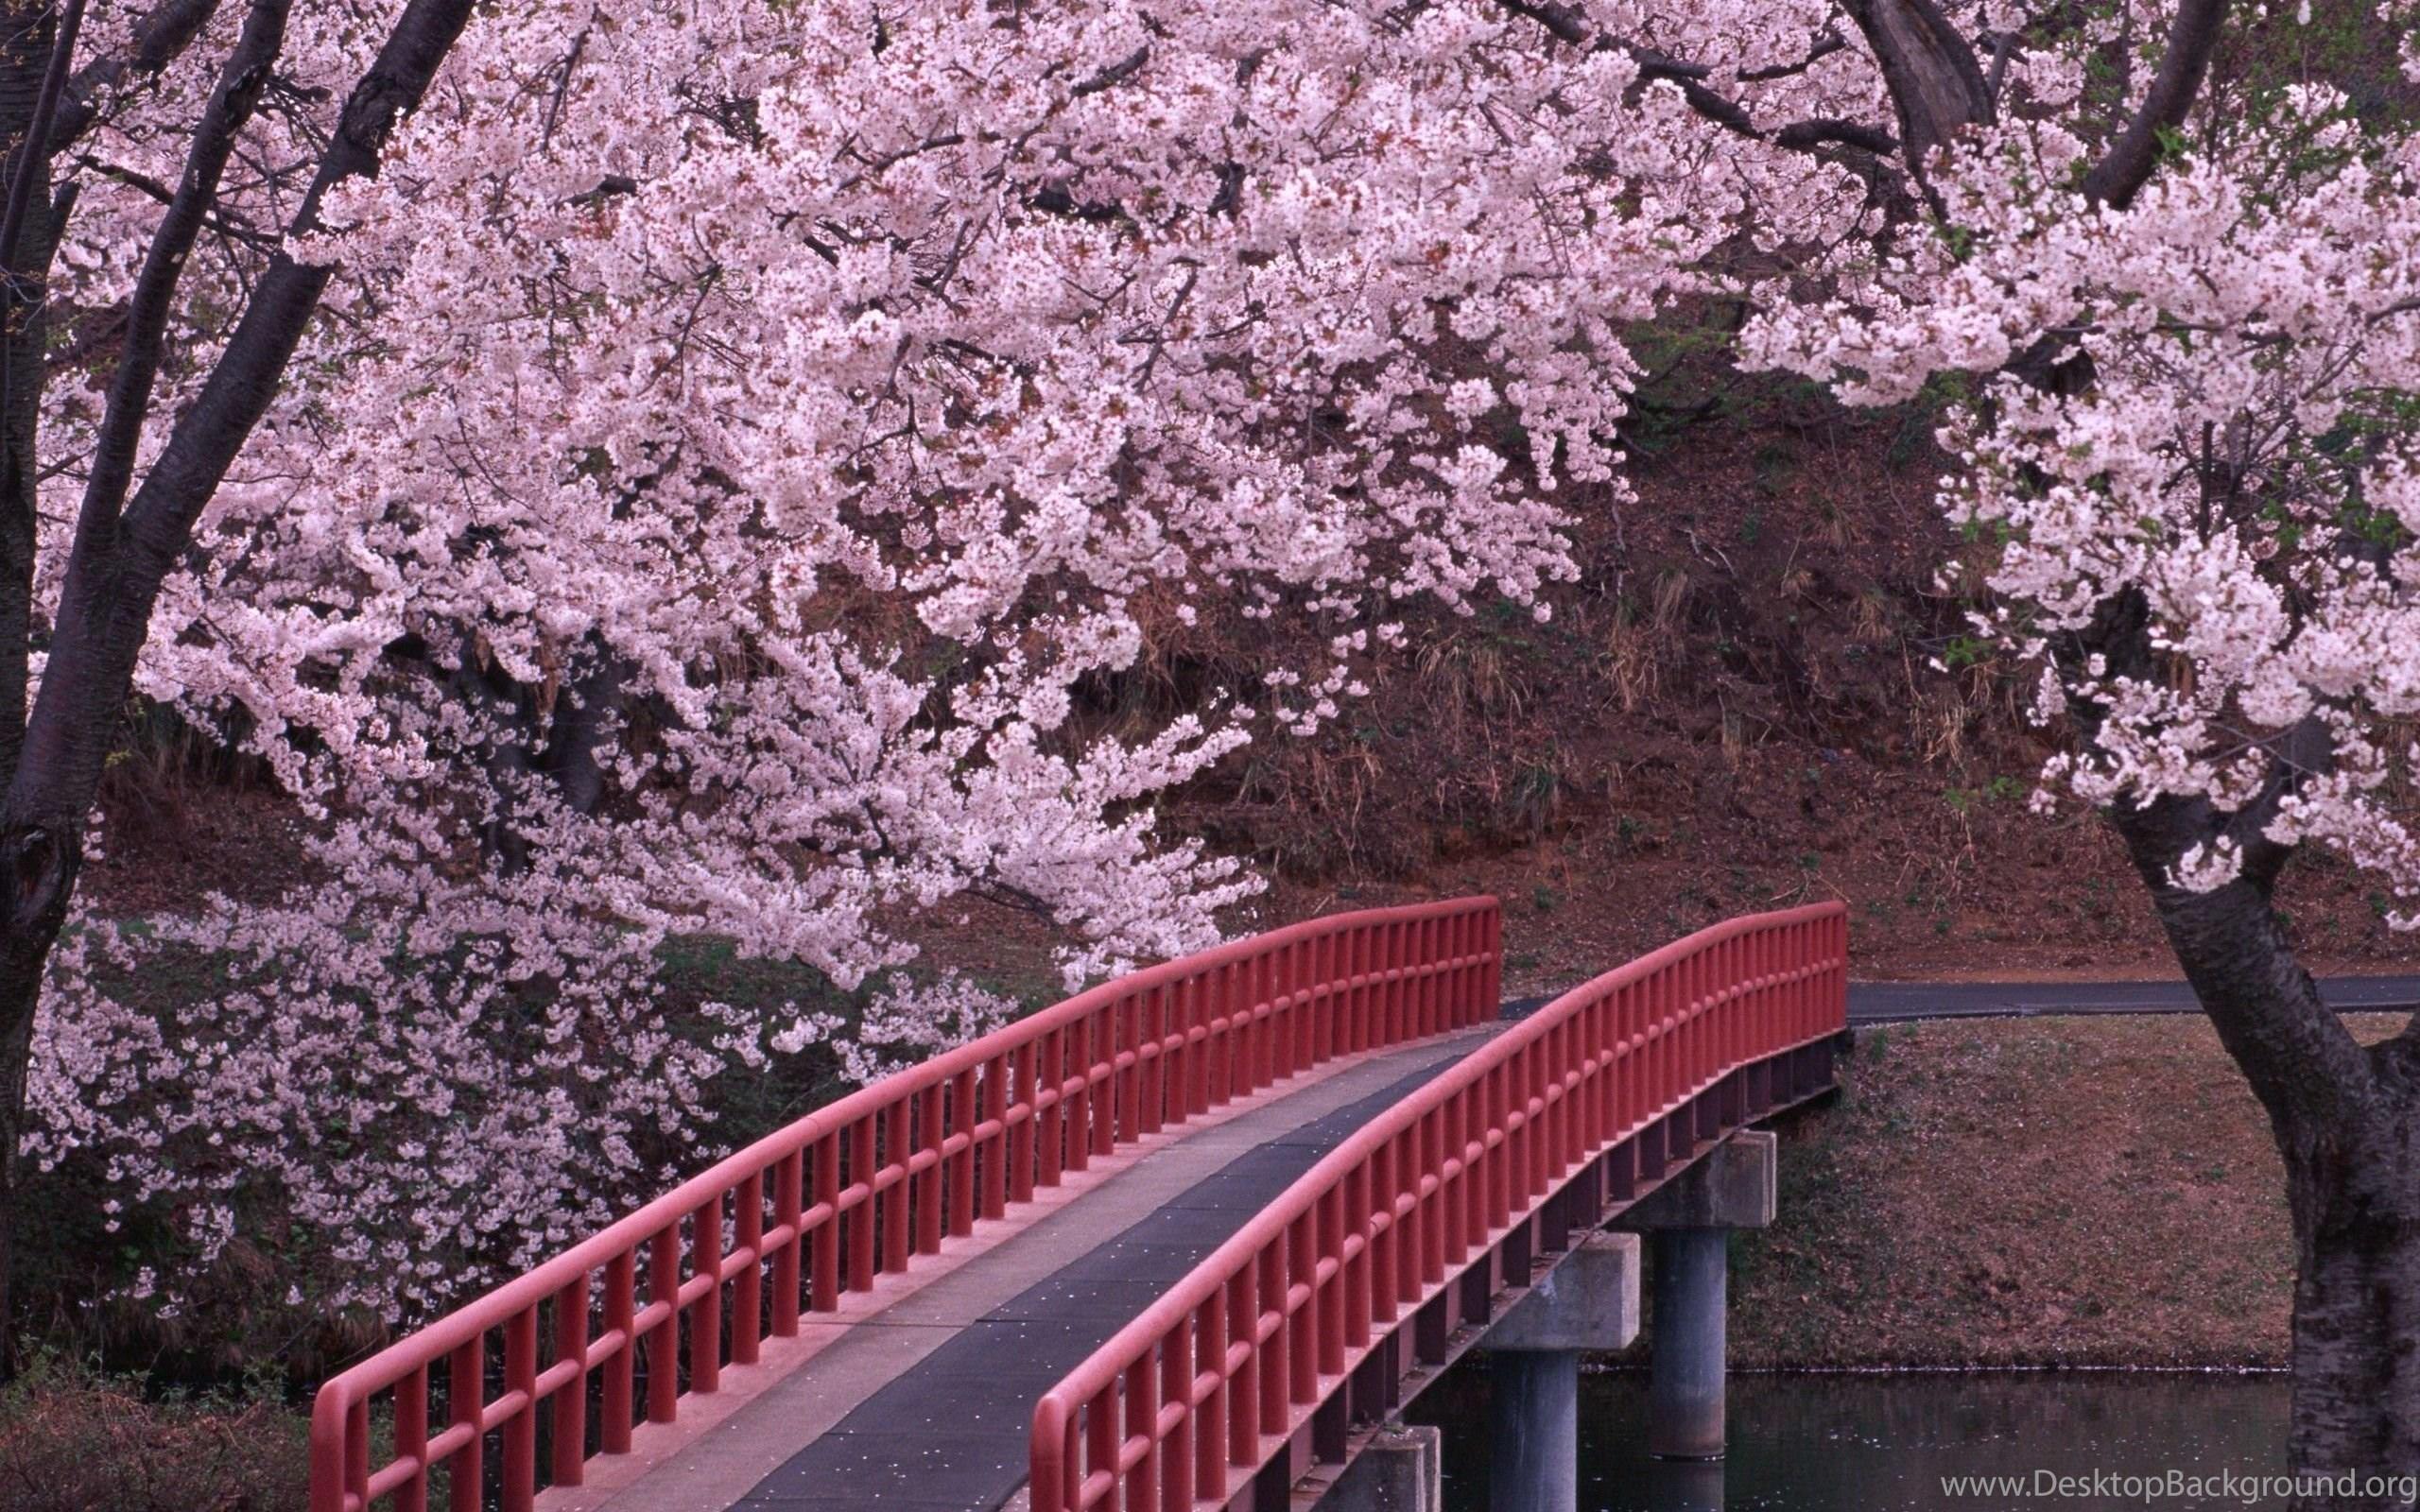 Japanese Cherry Blossom Desktop Backgrounds Hd 2560x1600 Desktop